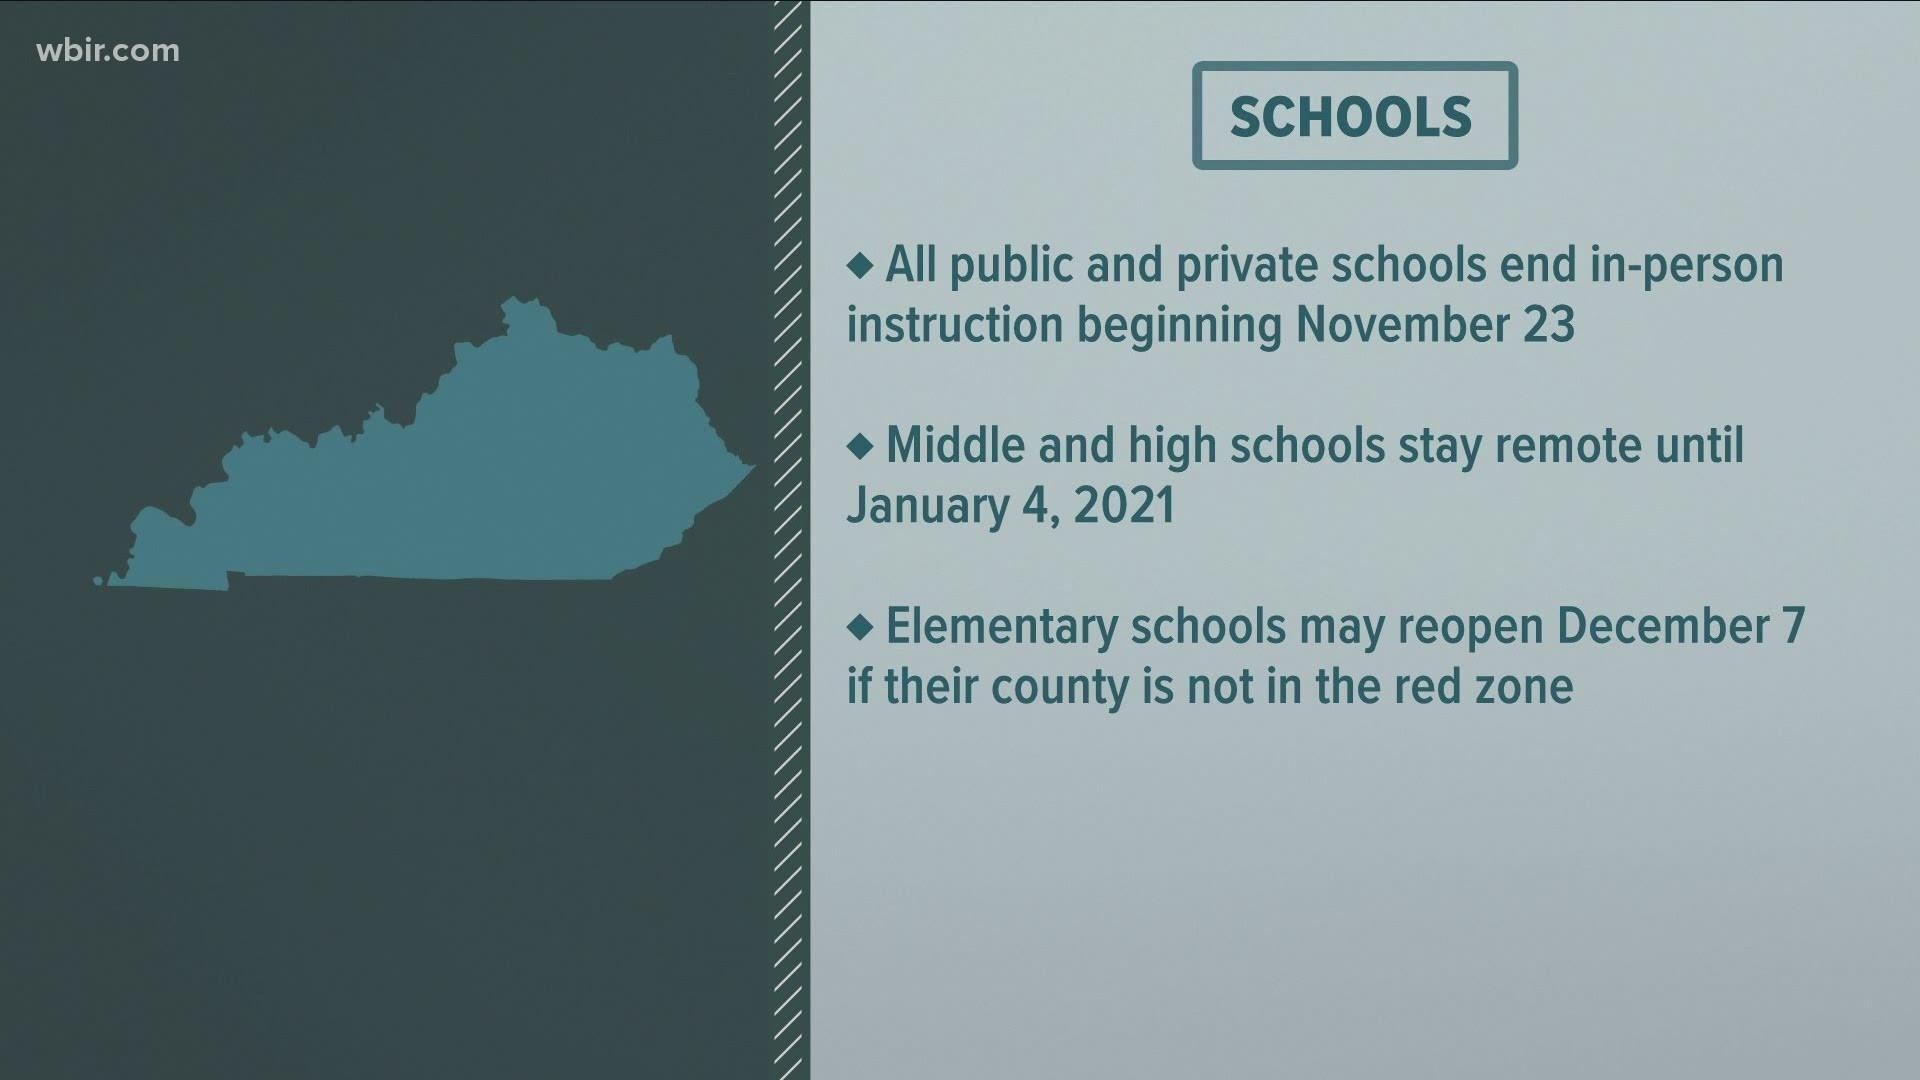 Kentucky S New Covid 19 Restrictions Wbir Com